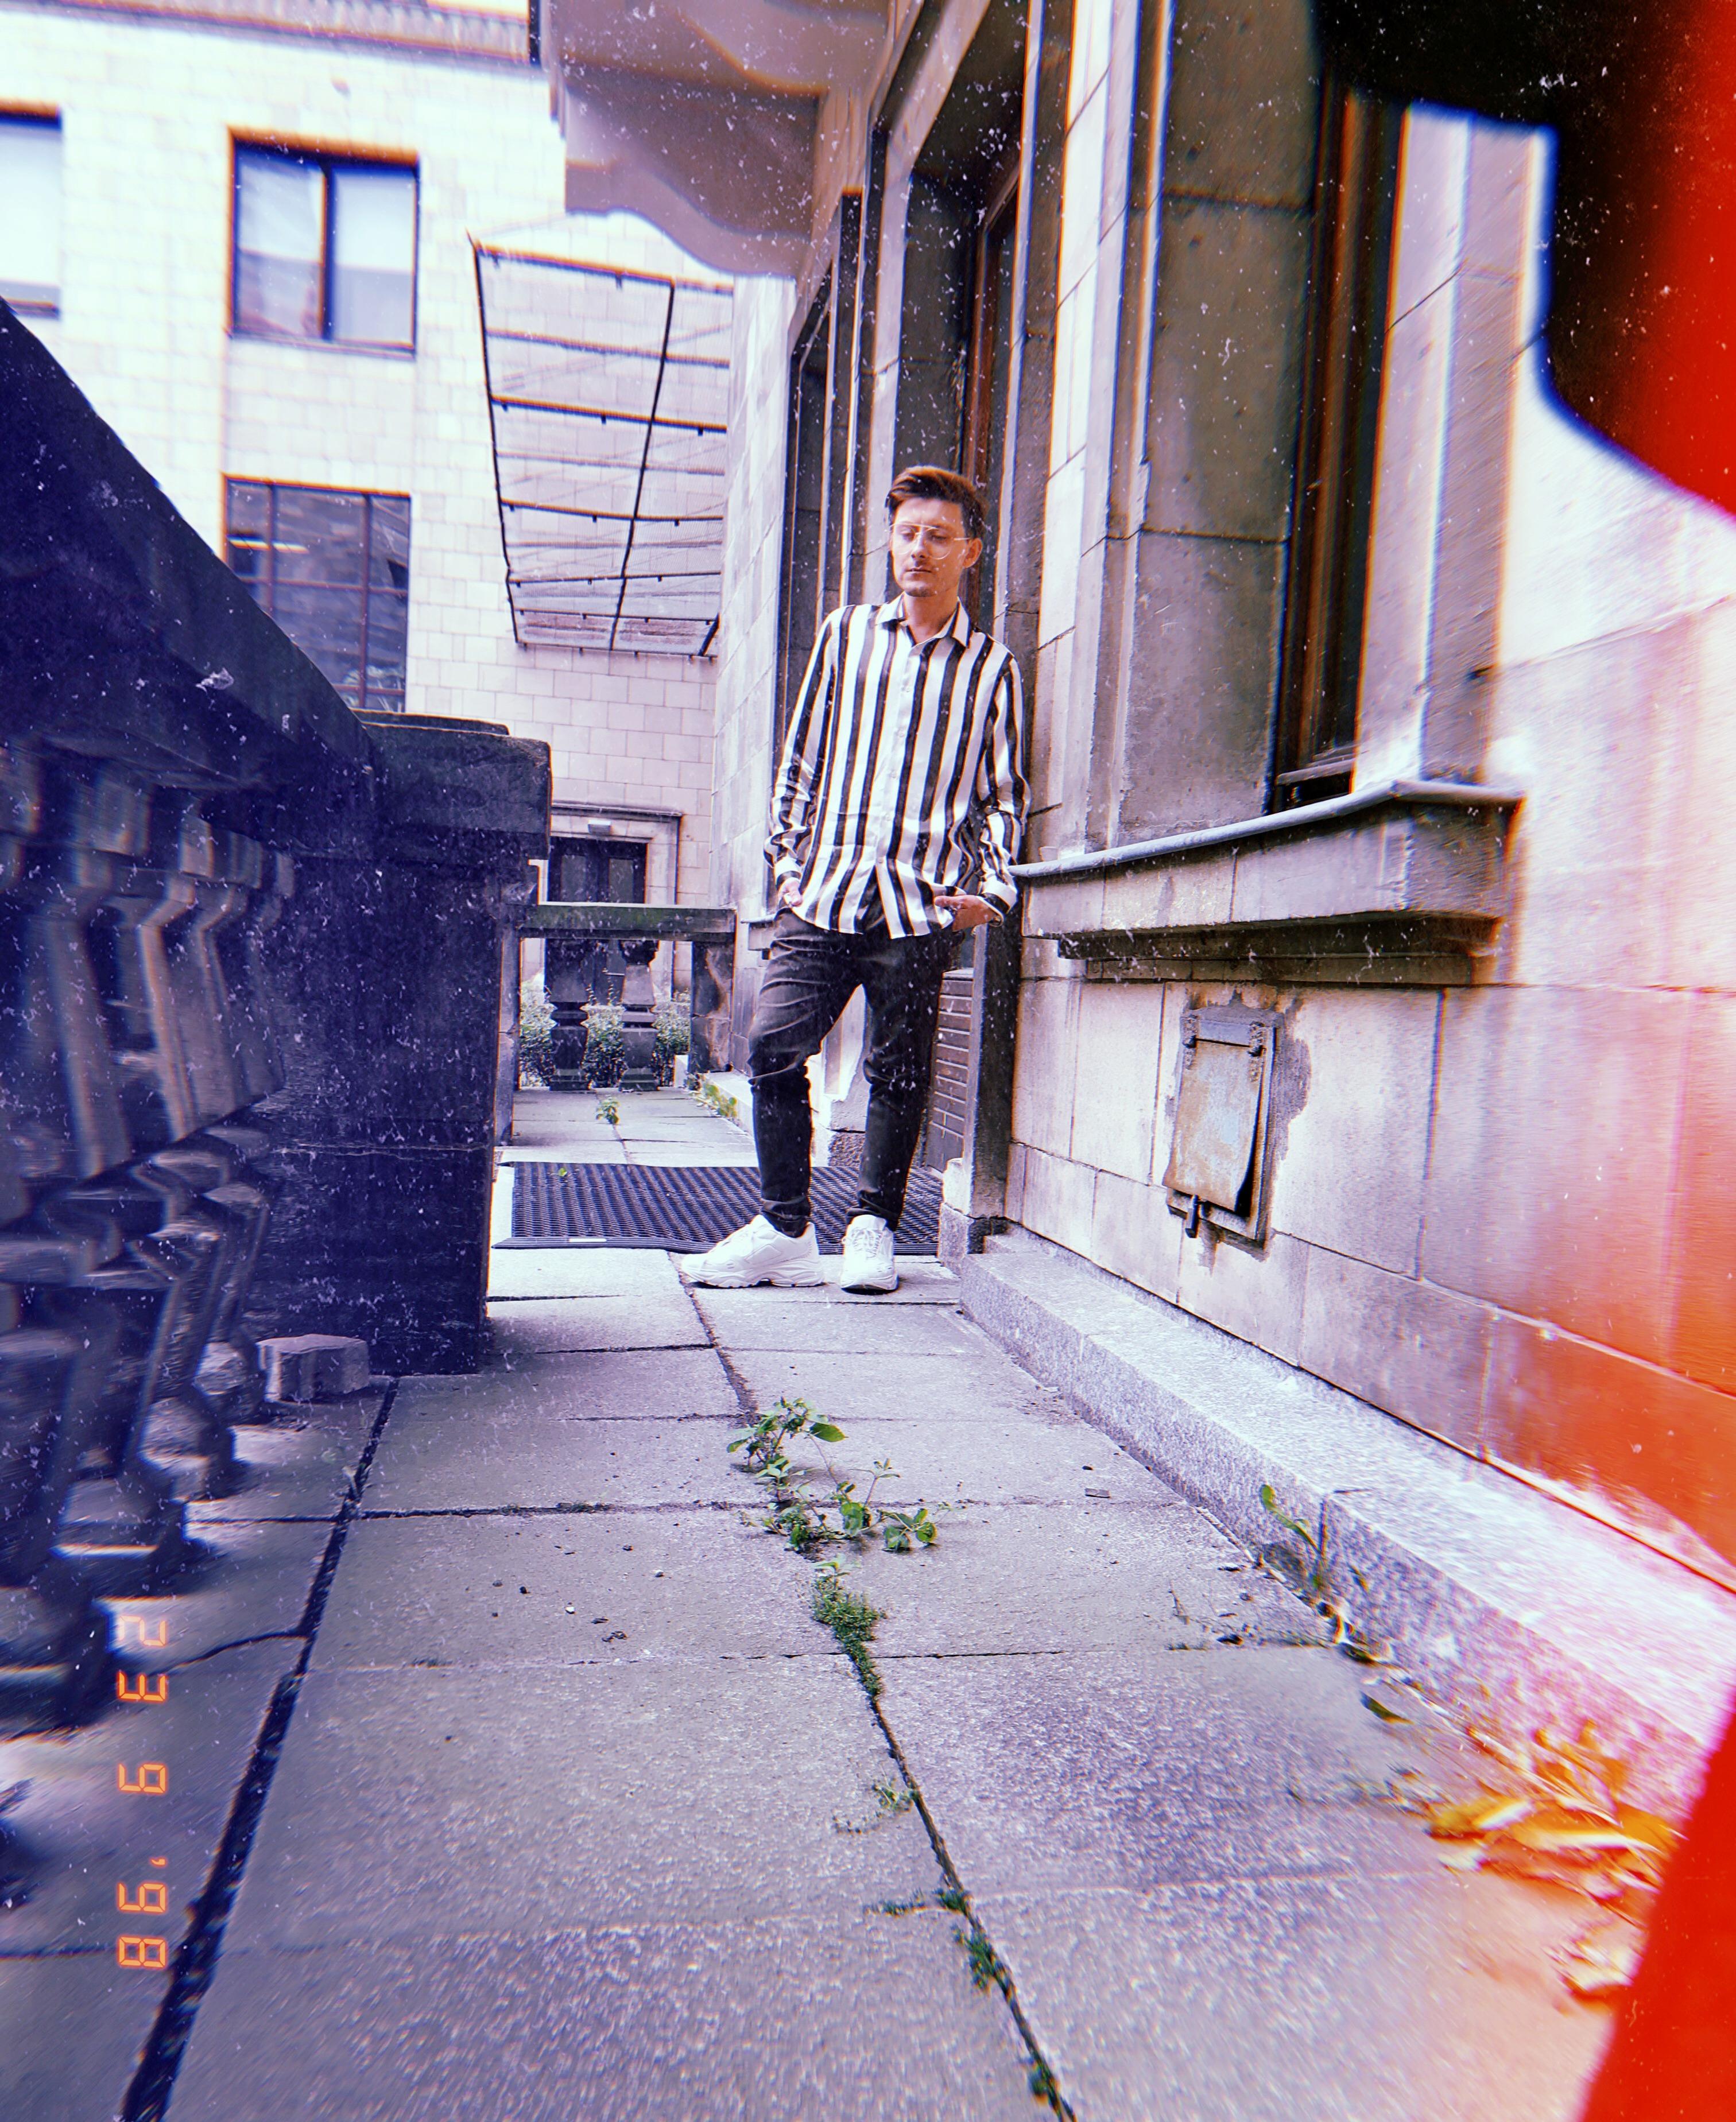 moda-uliczna-moda-m%C4%99ska-trendy-jesi